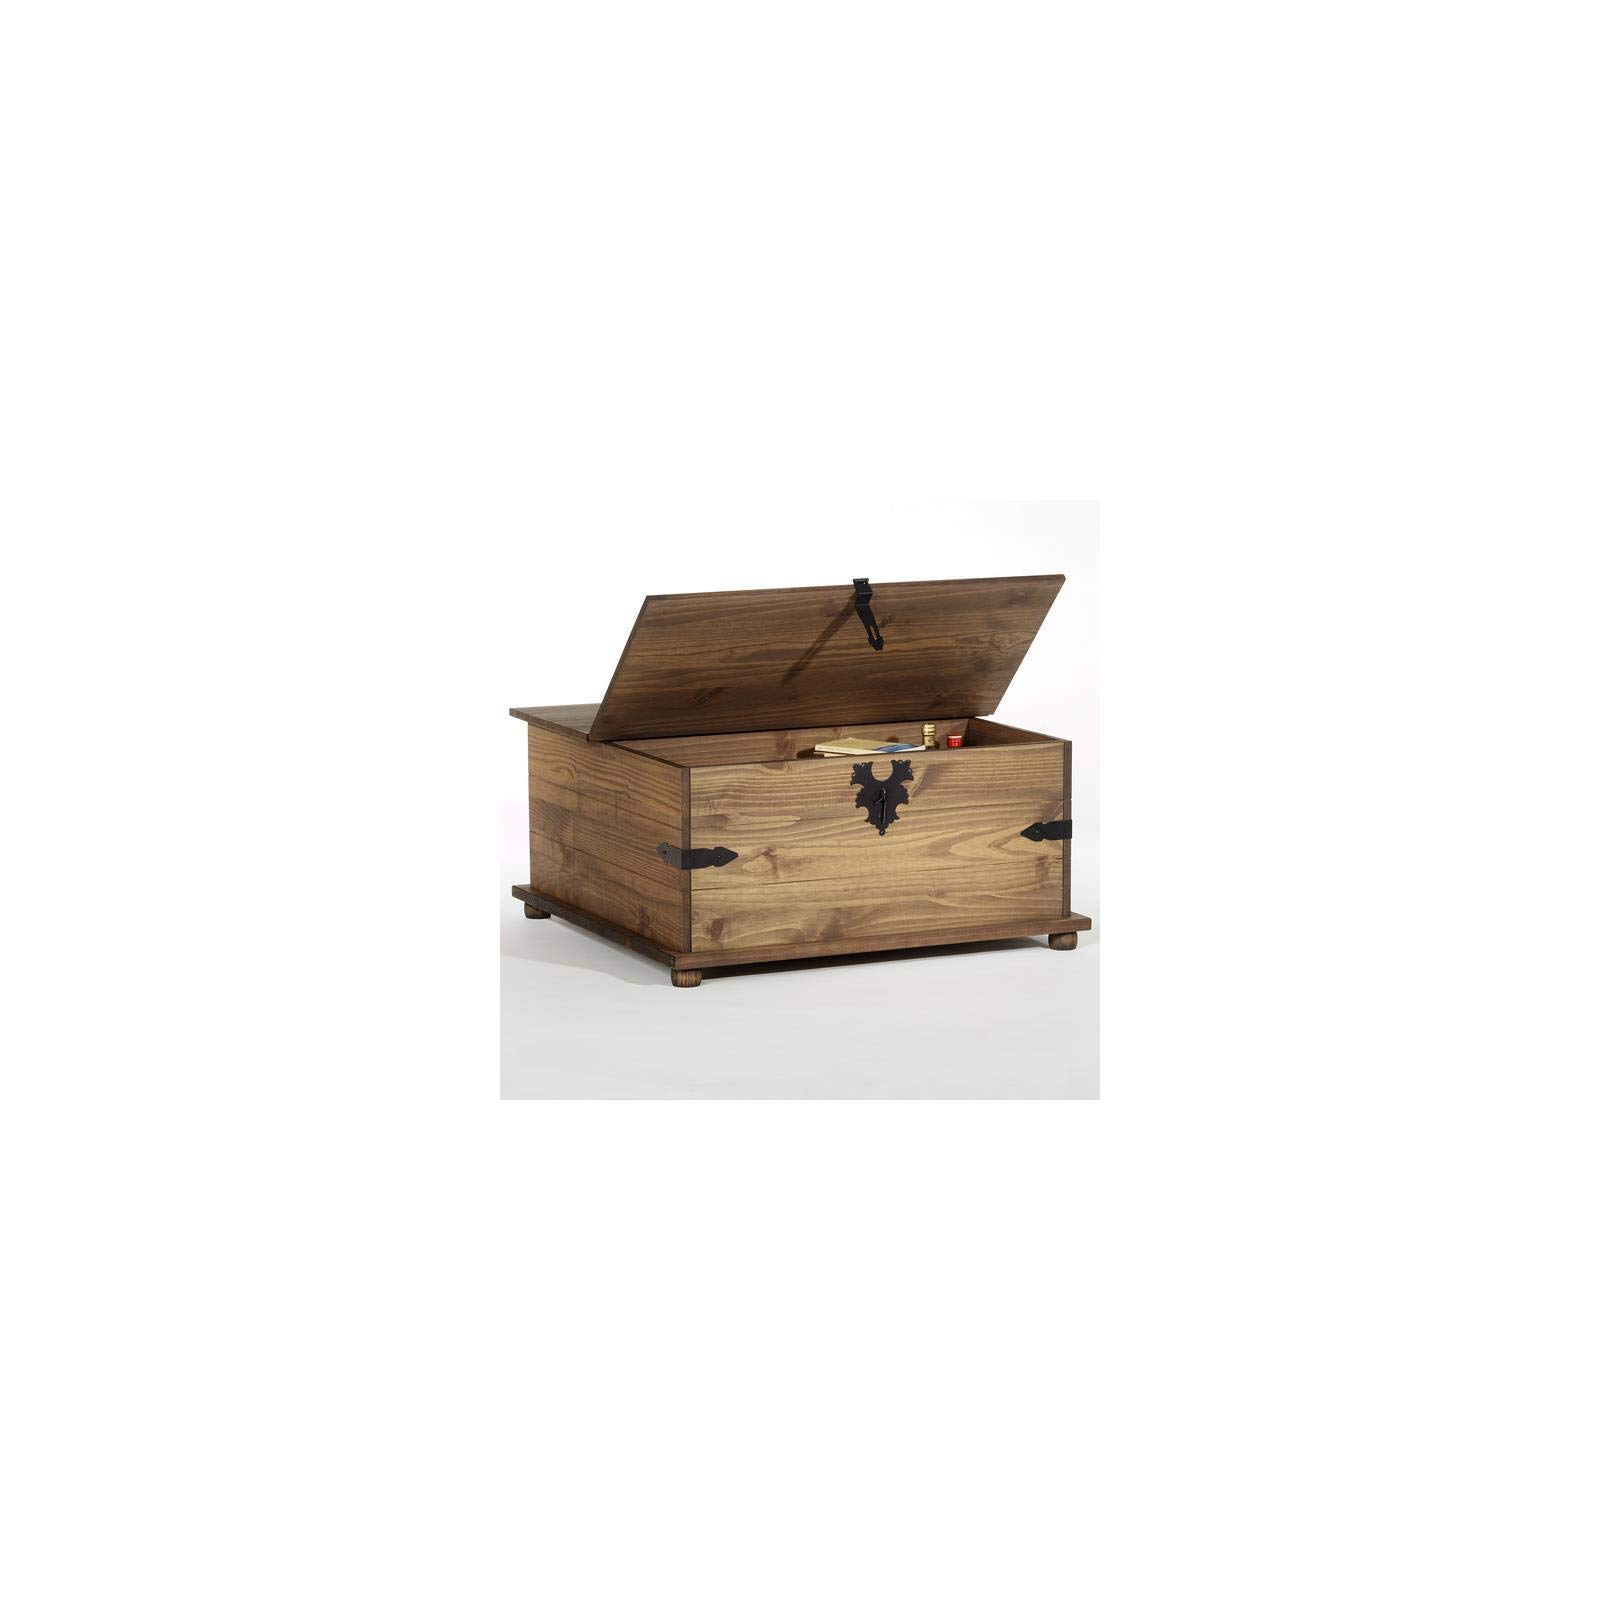 acheter populaire 5a081 db824 IDIMEX Table basse coffre TEQUILA rangement pin massif style mexicain  lasuré brun